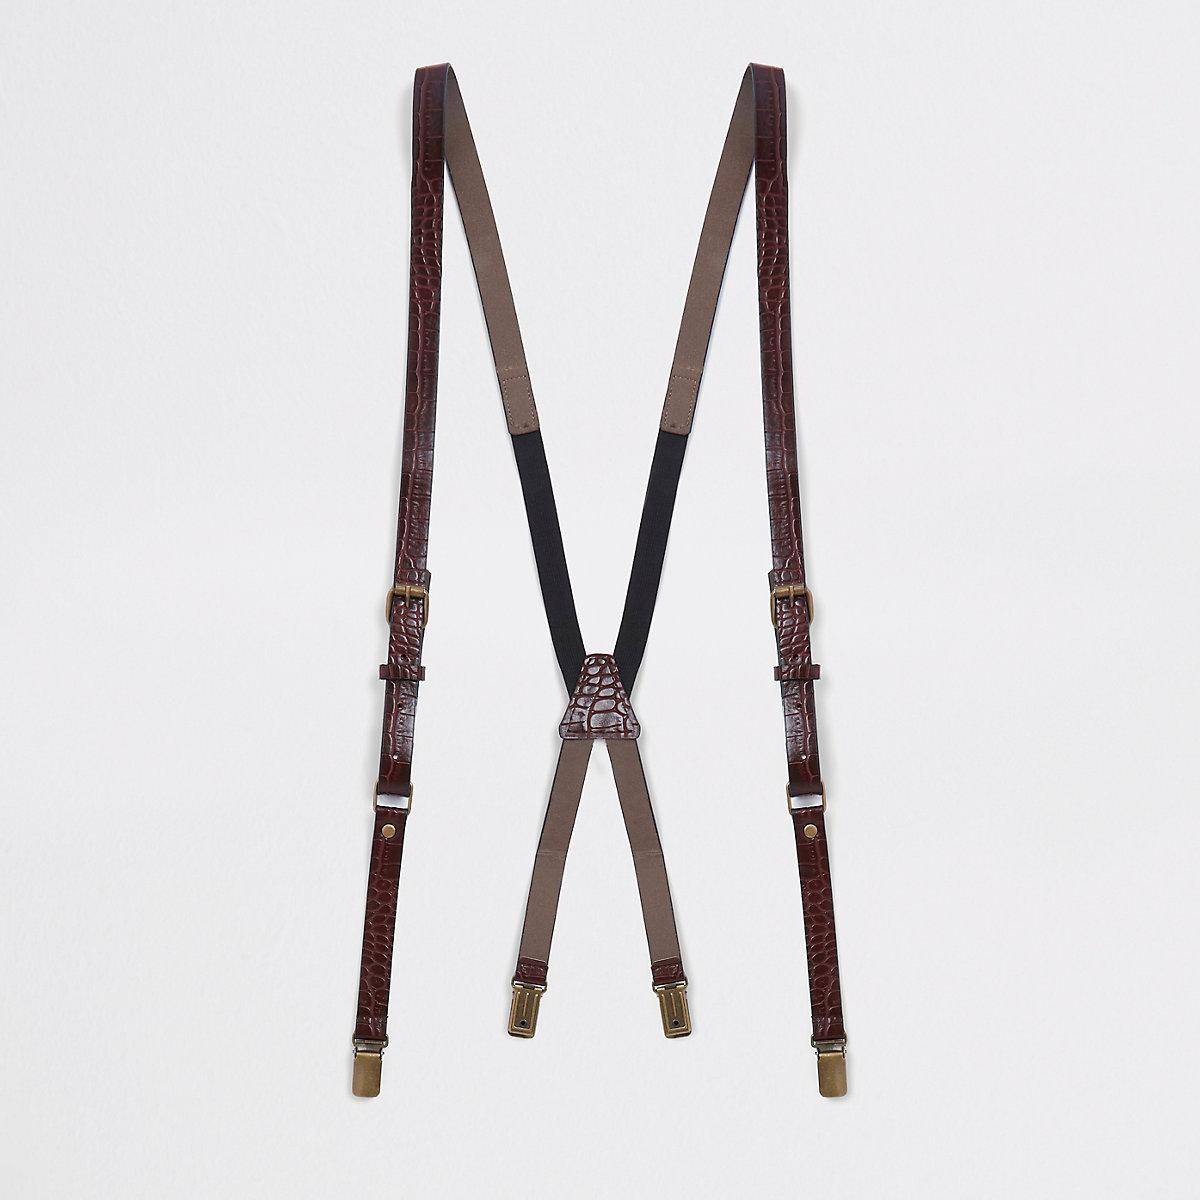 Red croc leather belt suspenders